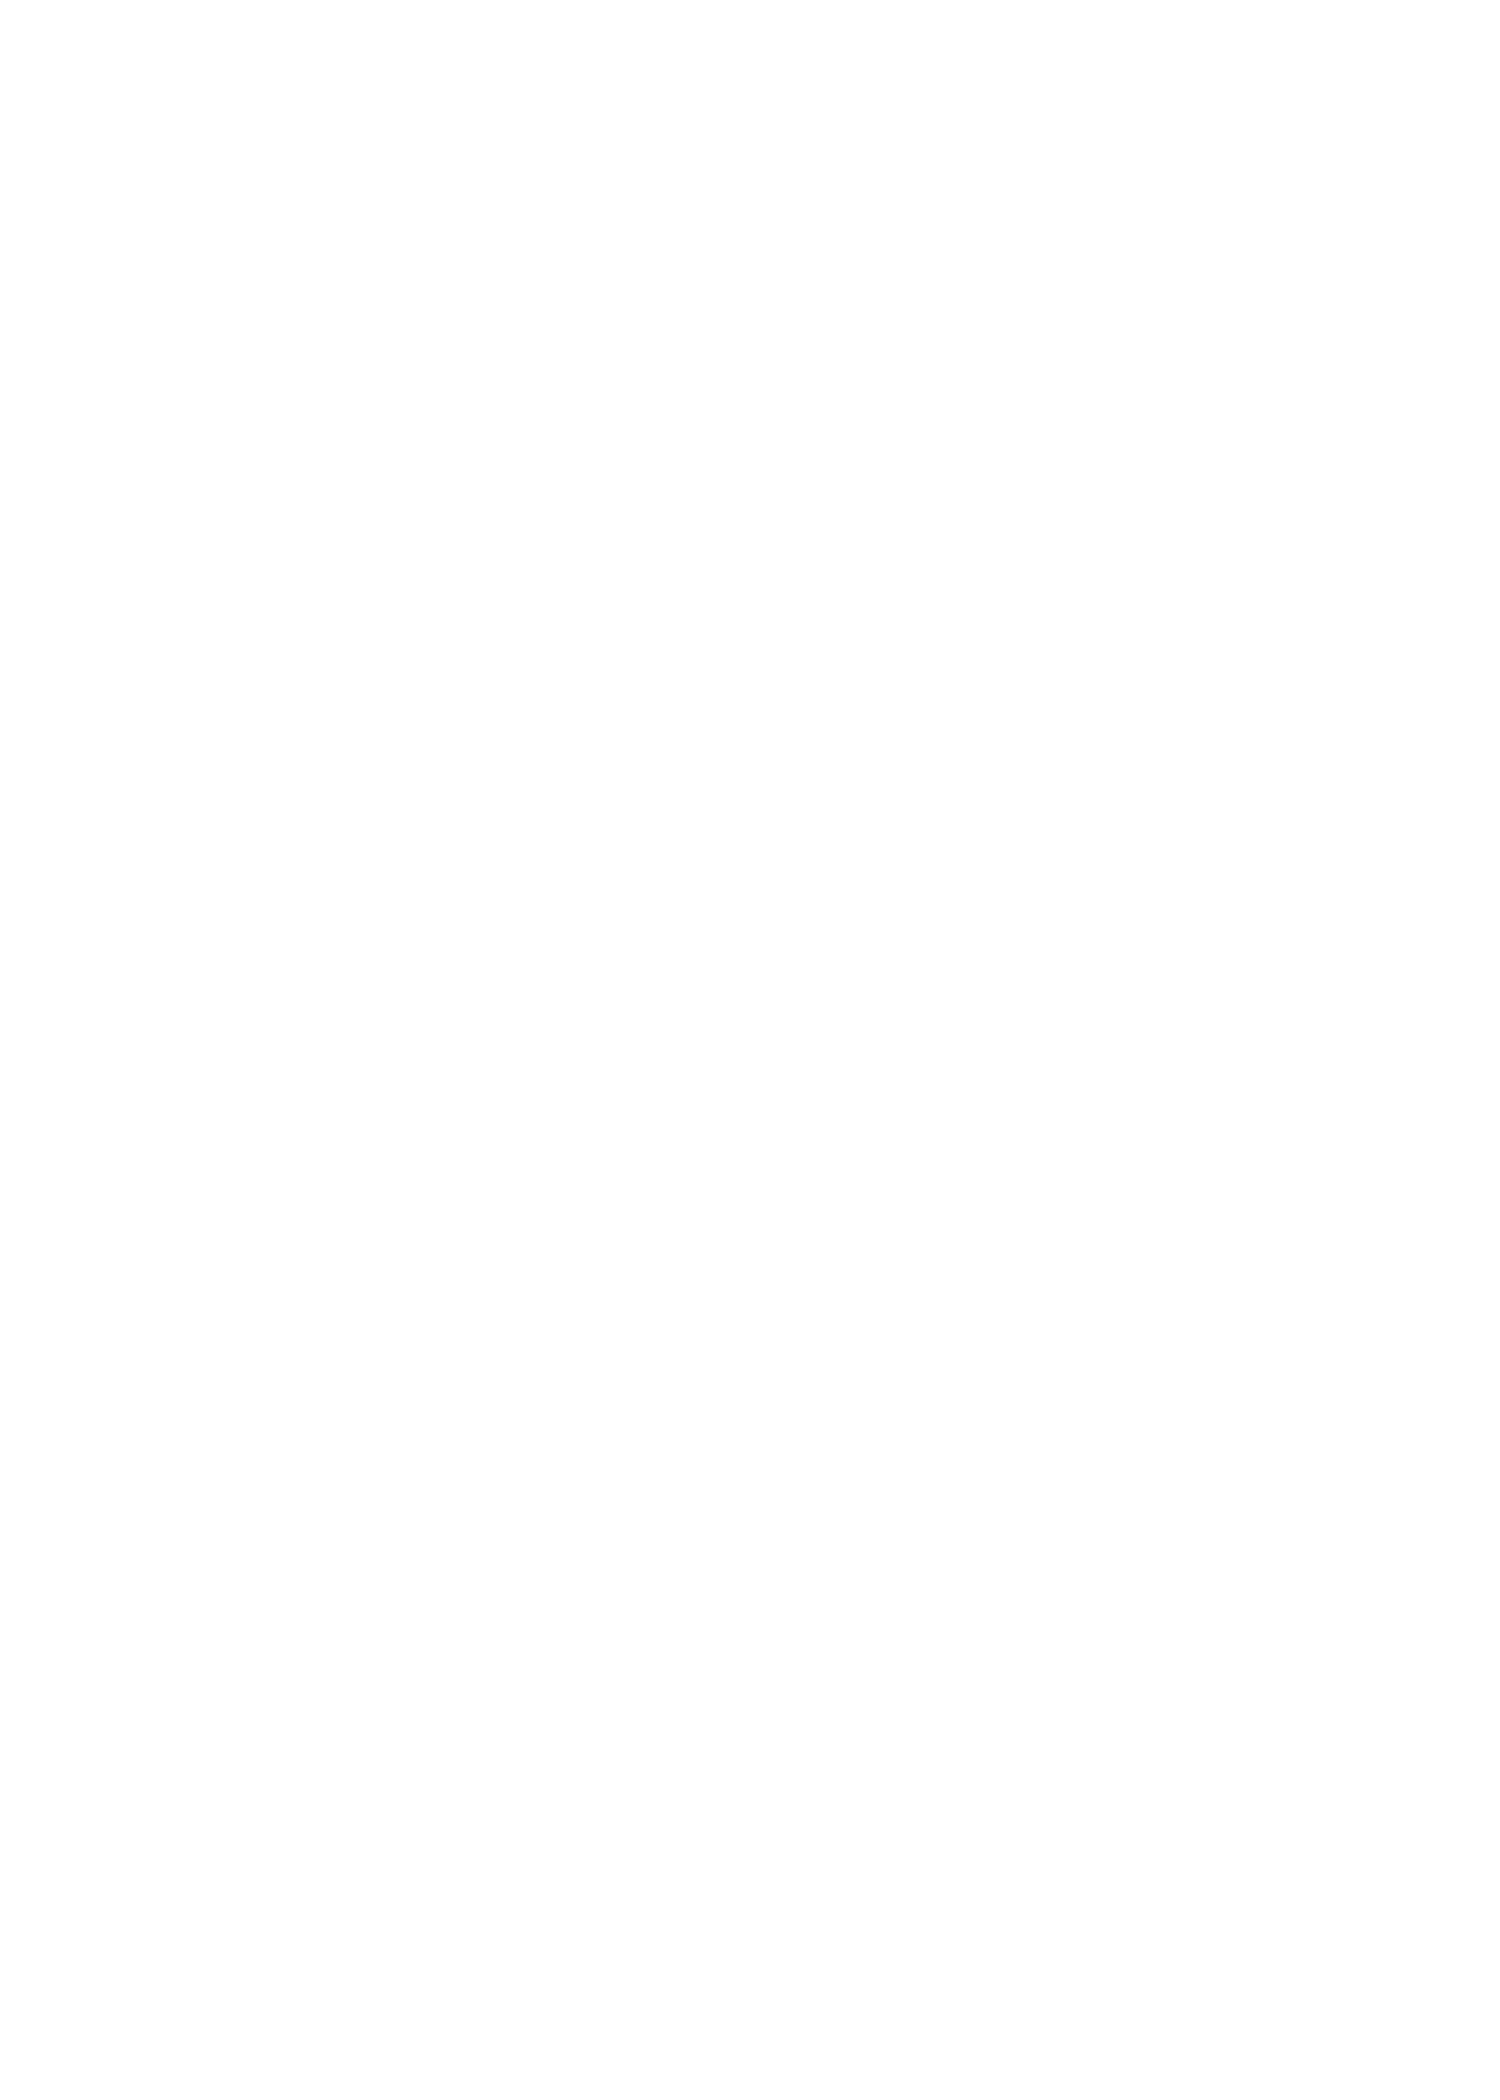 pent2495